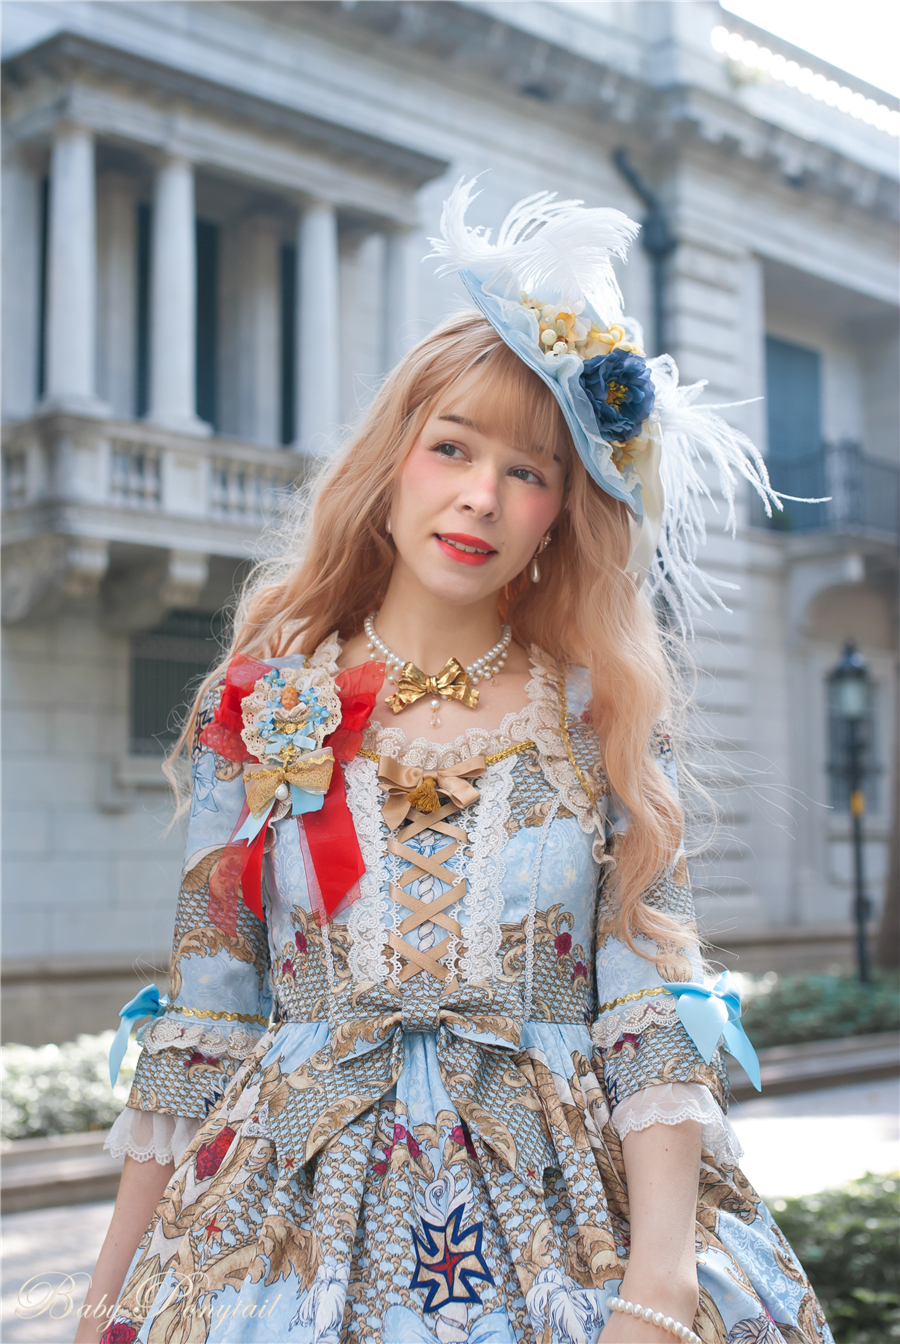 Baby Ponytail_Circus Princess_Sax OP_Claudia_03.jpg